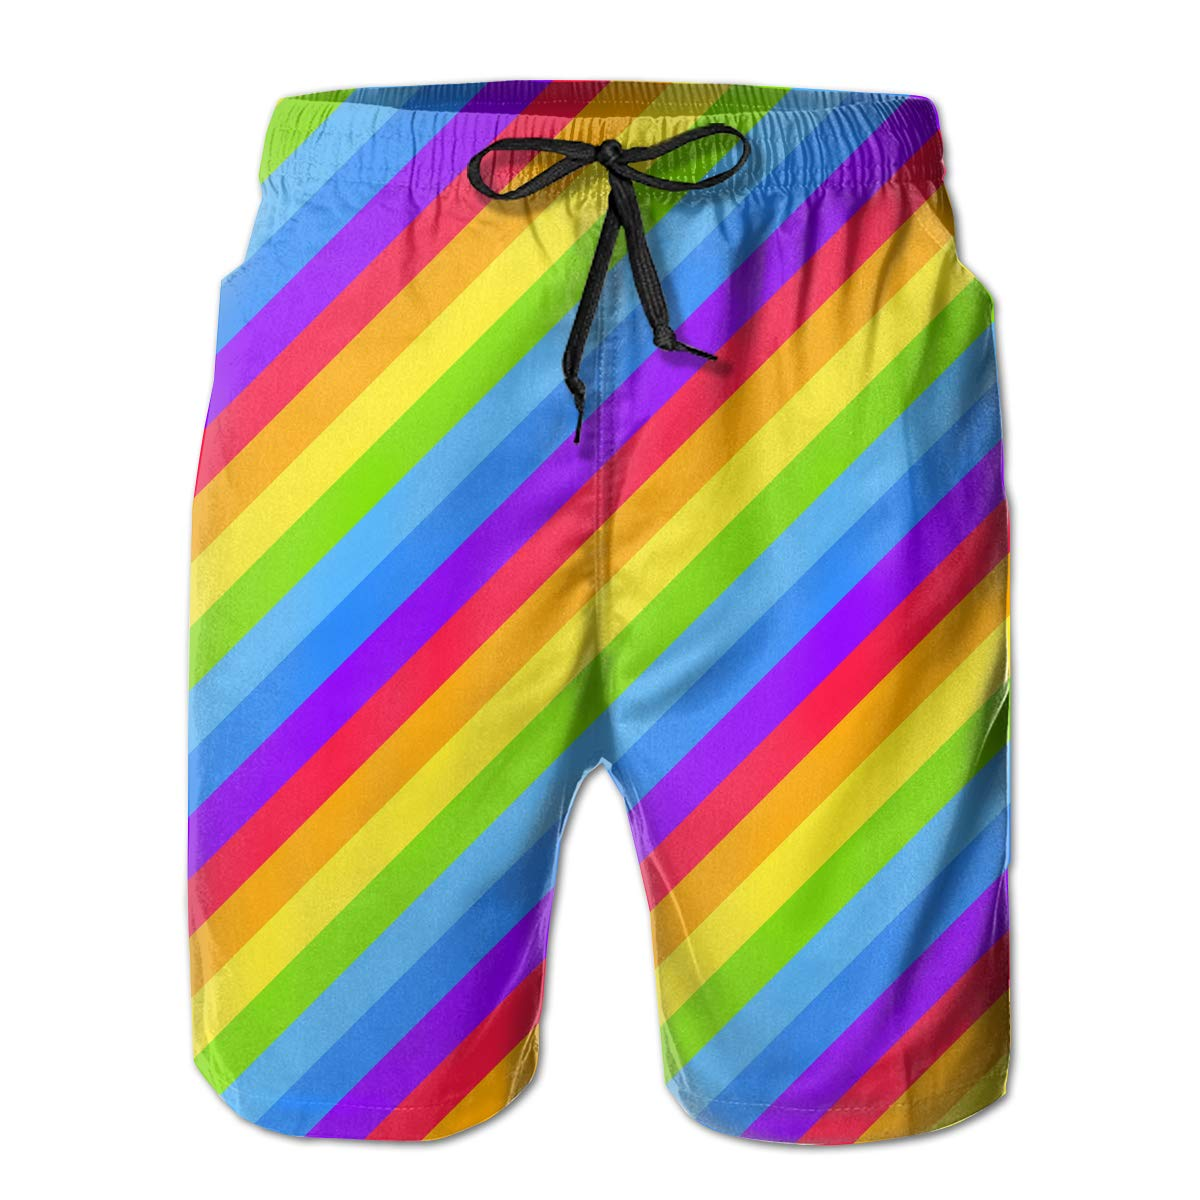 UHT28DG Geometric LGBT Flag Pattern Mens Board//Beach Shorts Fashion Swimming Shorts